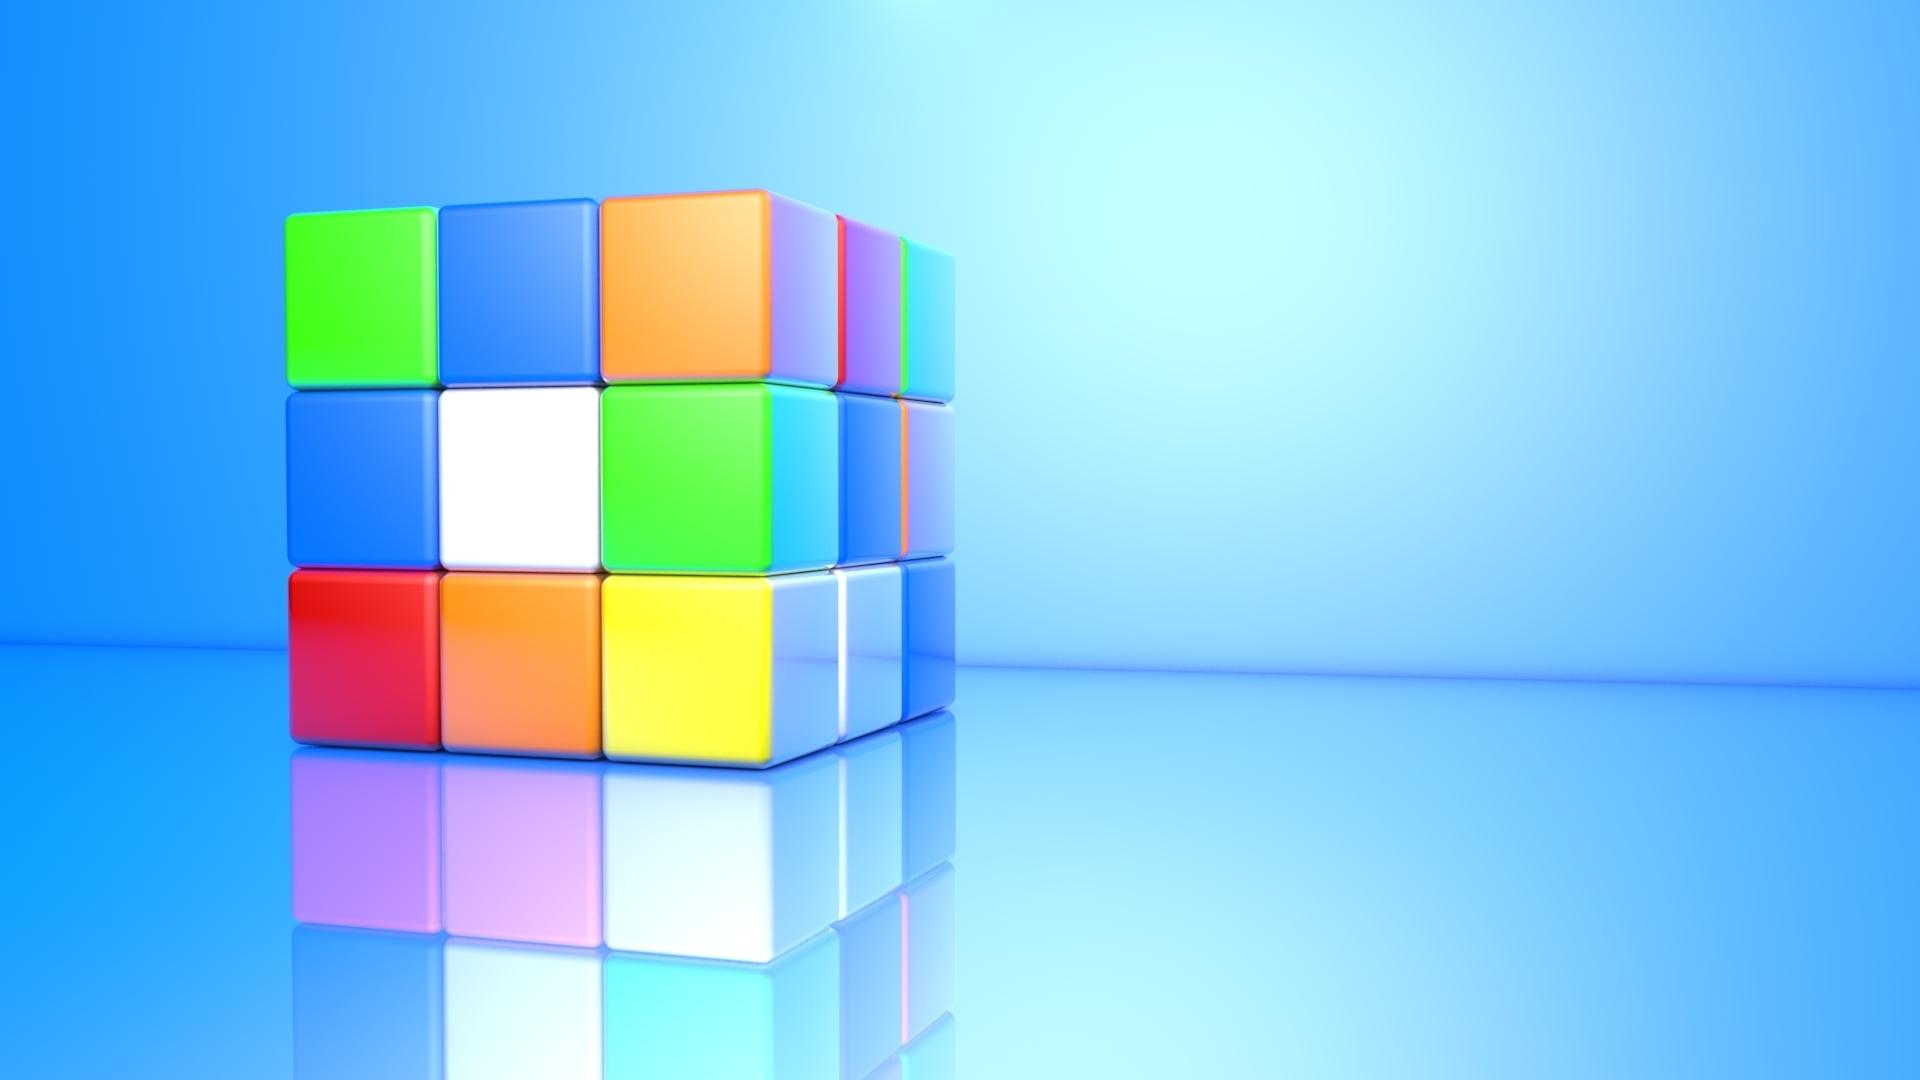 Rubiks Cube Wallpaper 2053 1920 x 1080   WallpaperLayercom 1920x1080